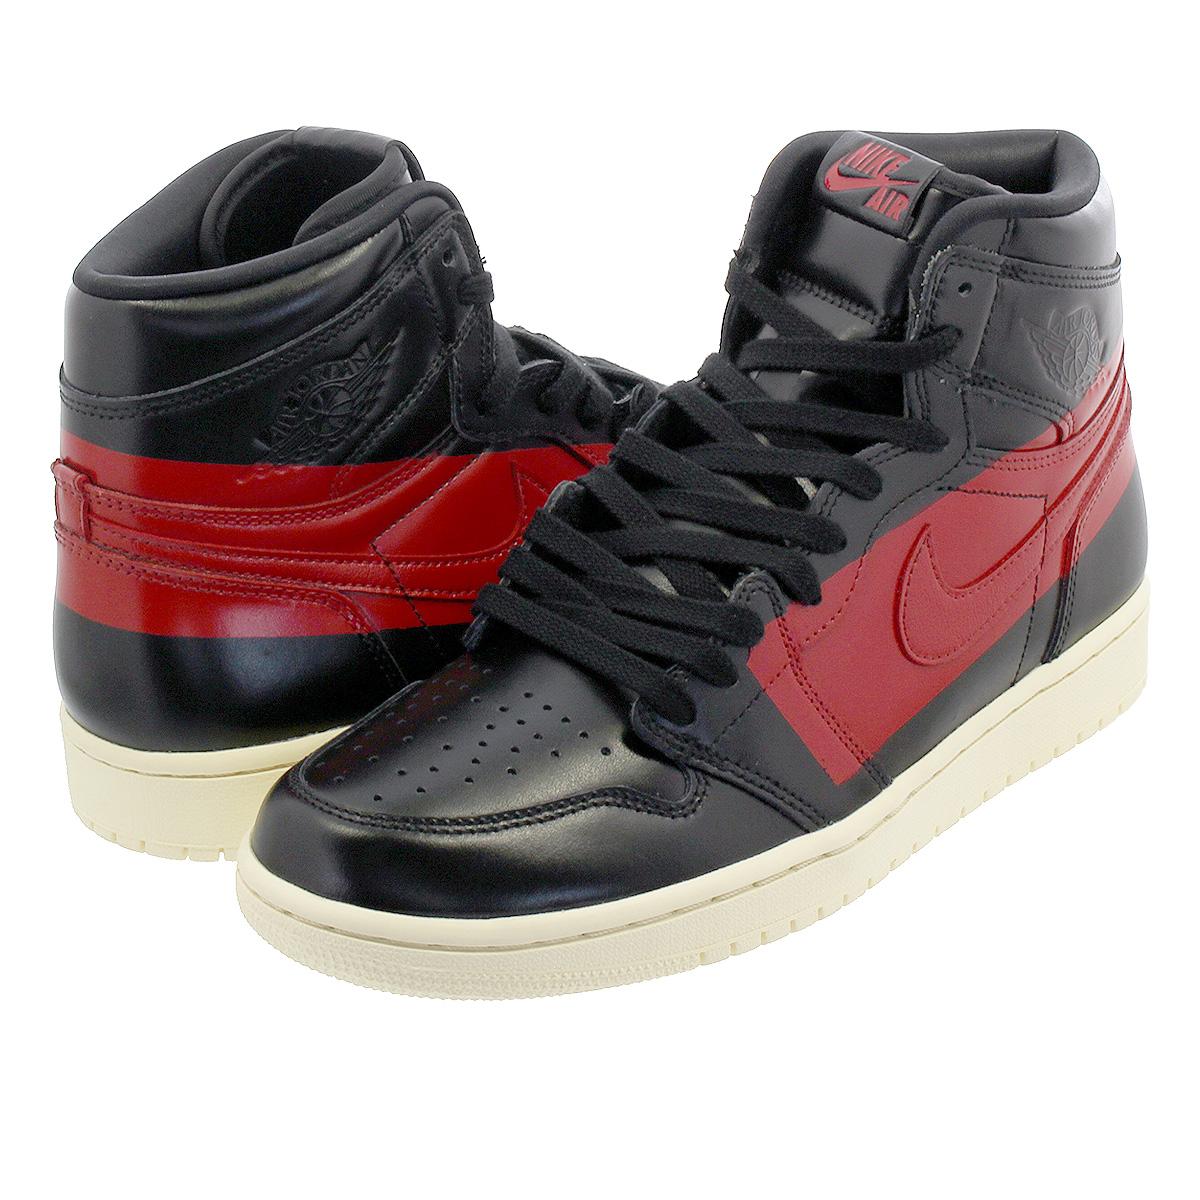 on sale best quality casual shoes NIKE AIR JORDAN 1 RETRO HIGH OG DEFIANT Nike Air Jordan 1 nostalgic high OG  ディファイント BLACK/UNIVERSITY RED/MUSLIN bq6682-006